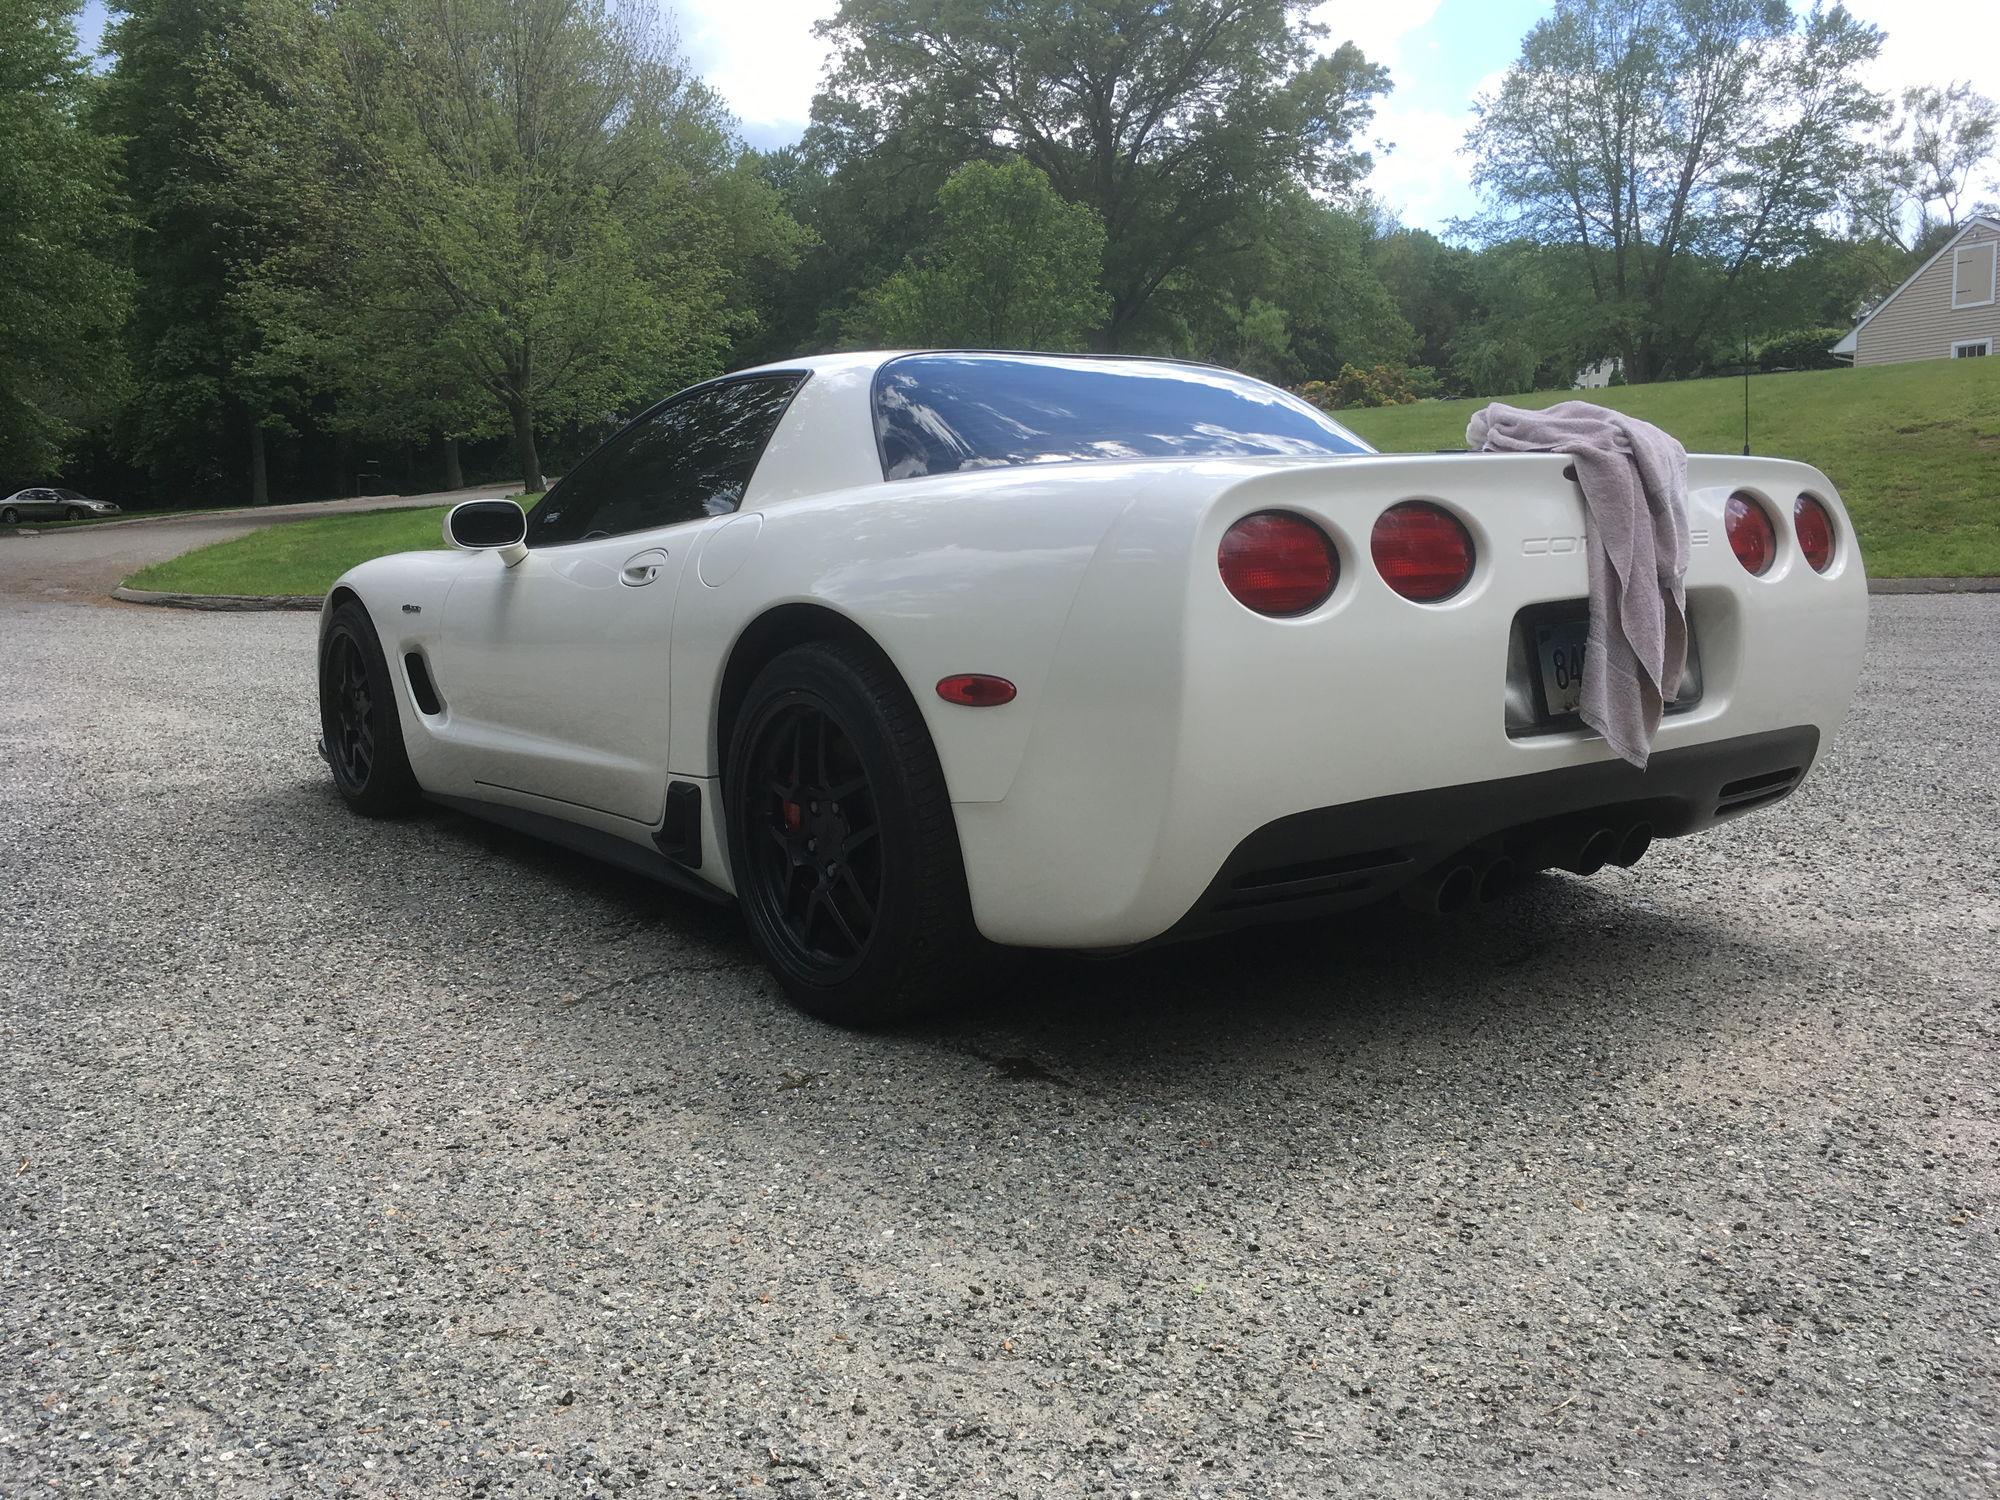 fs for sale wts speedway white z06 in ct corvetteforum chevrolet corvette forum discussion. Black Bedroom Furniture Sets. Home Design Ideas